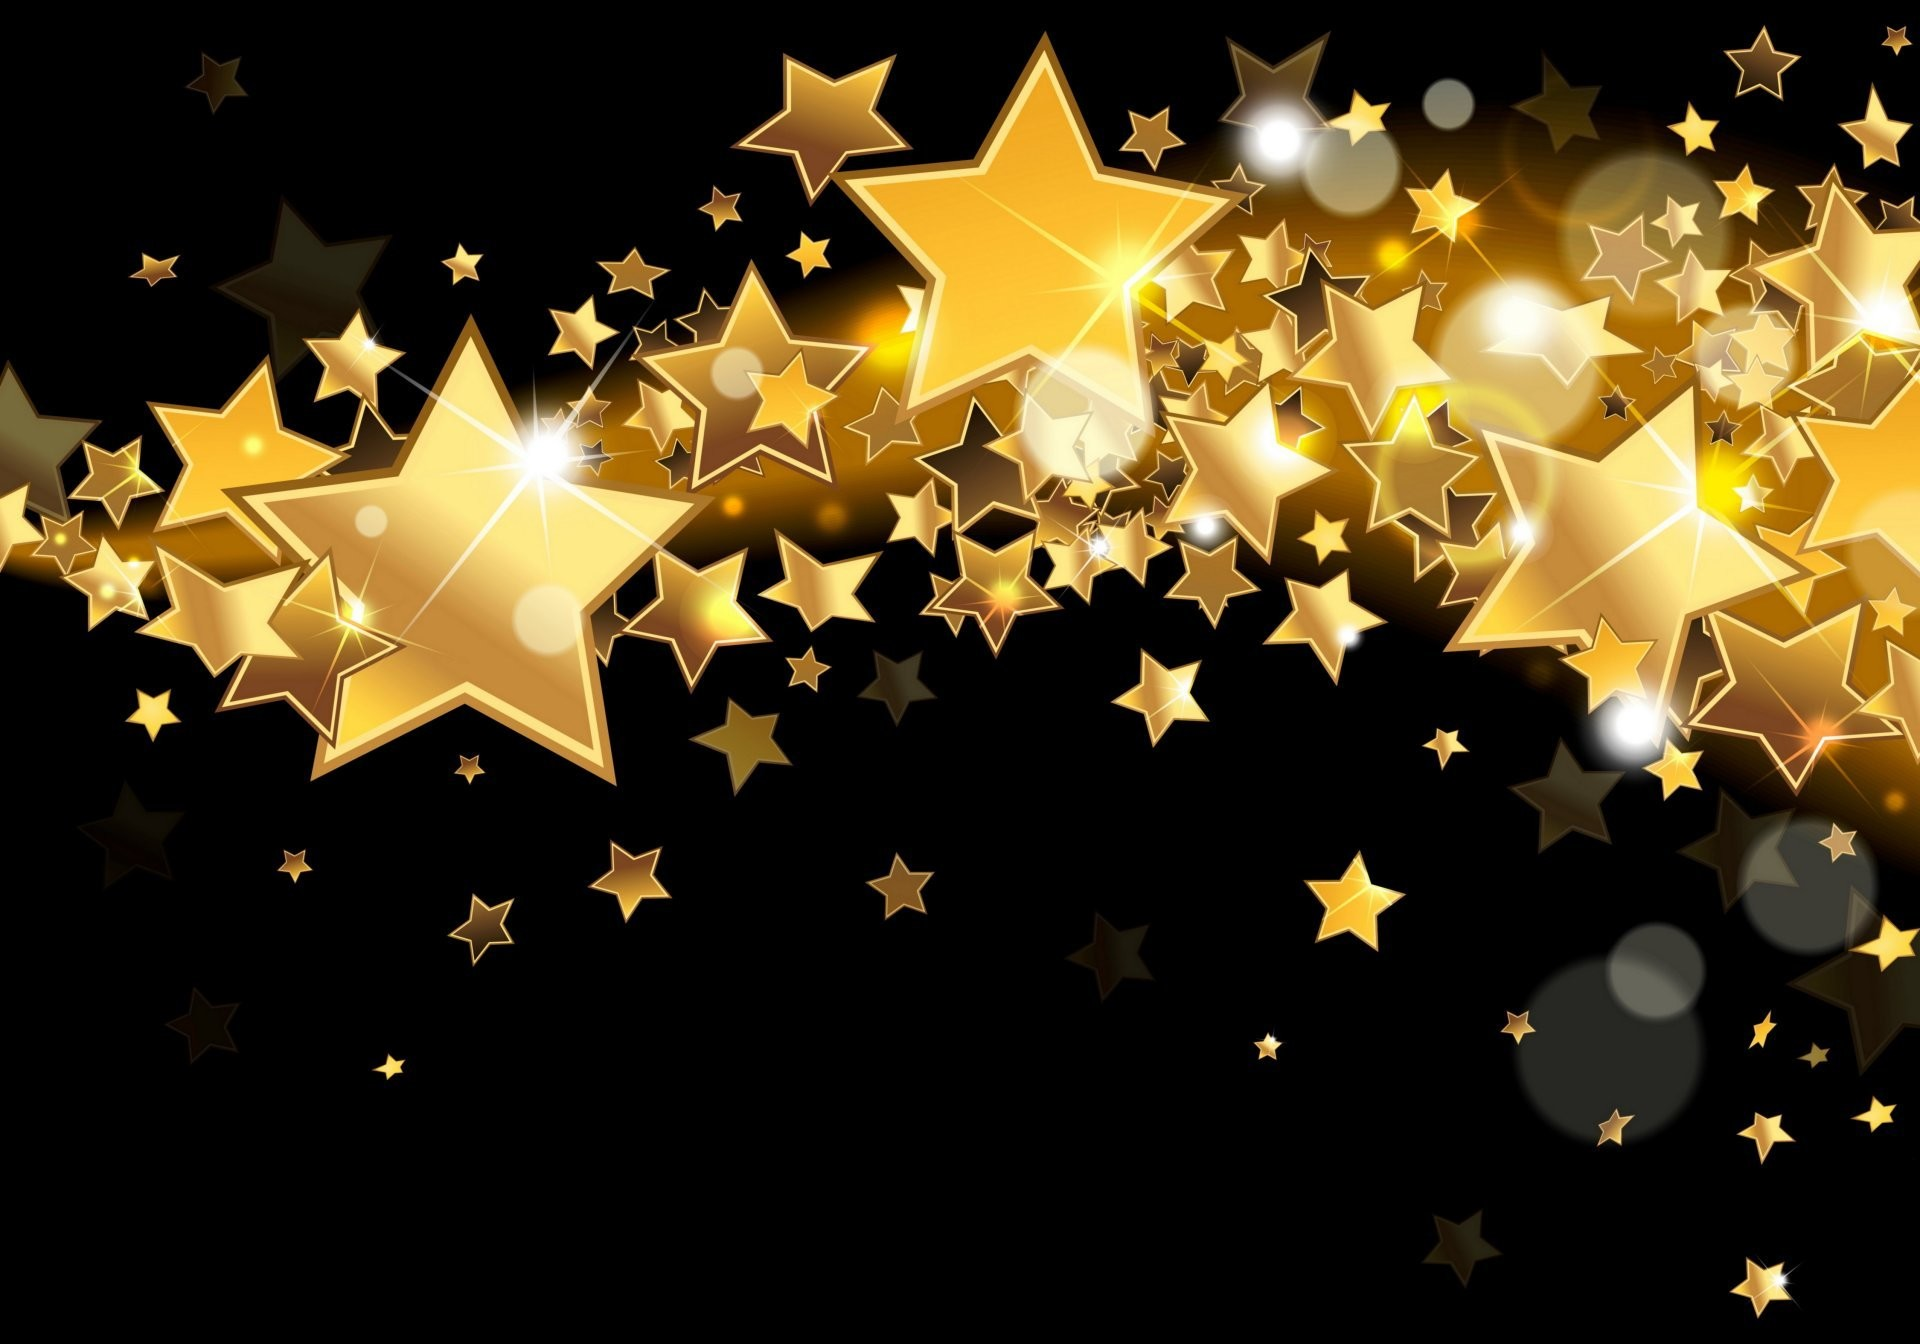 Wallpaper, Gold Star (3457014)